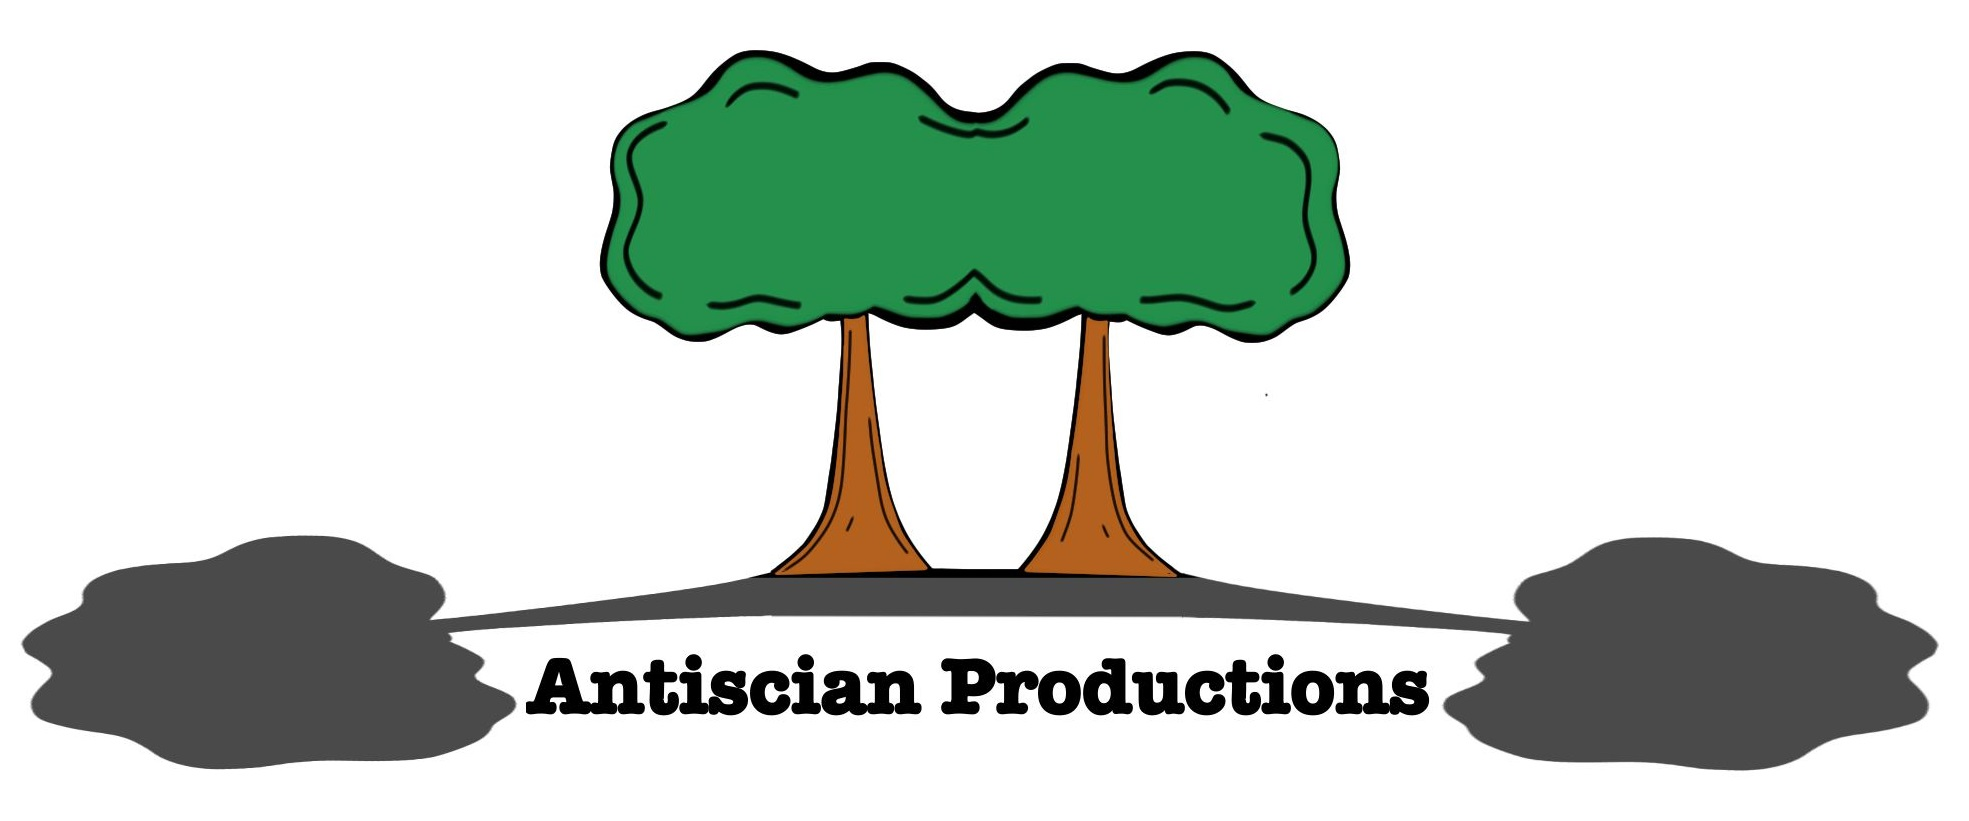 Antiscian Productions Logo